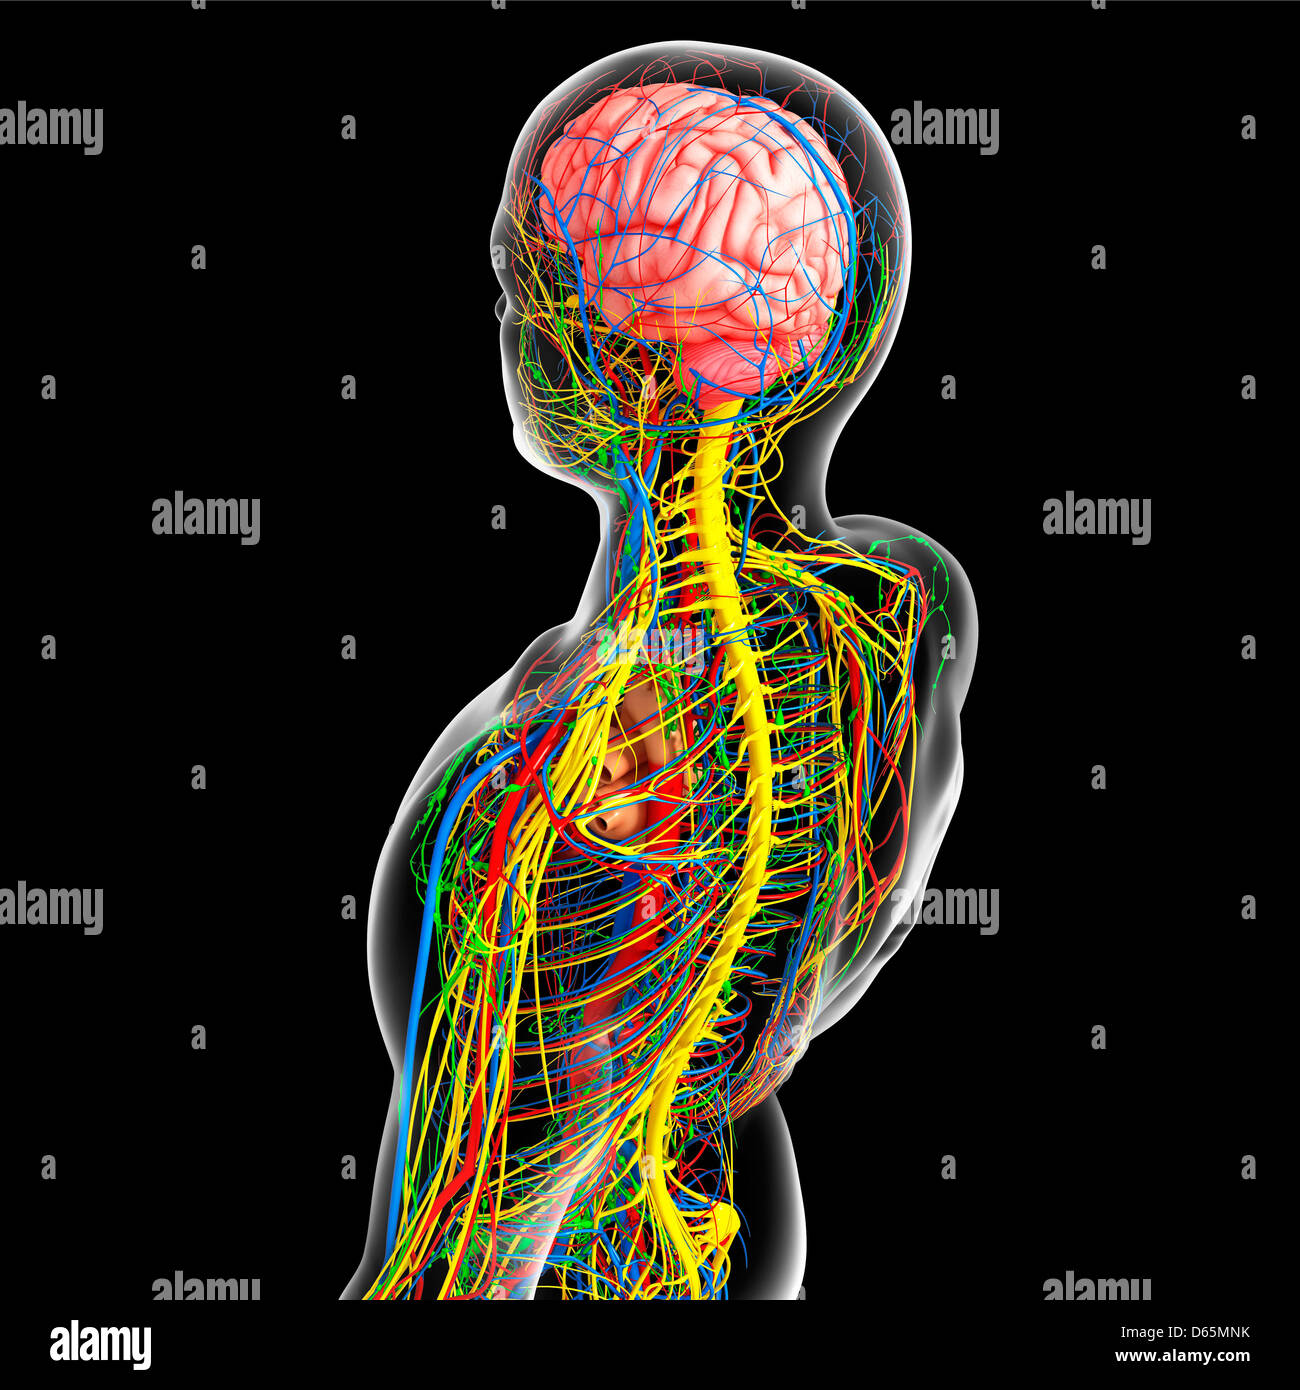 Oberkörper-Anatomie, artwork Stockfoto, Bild: 55445087 - Alamy